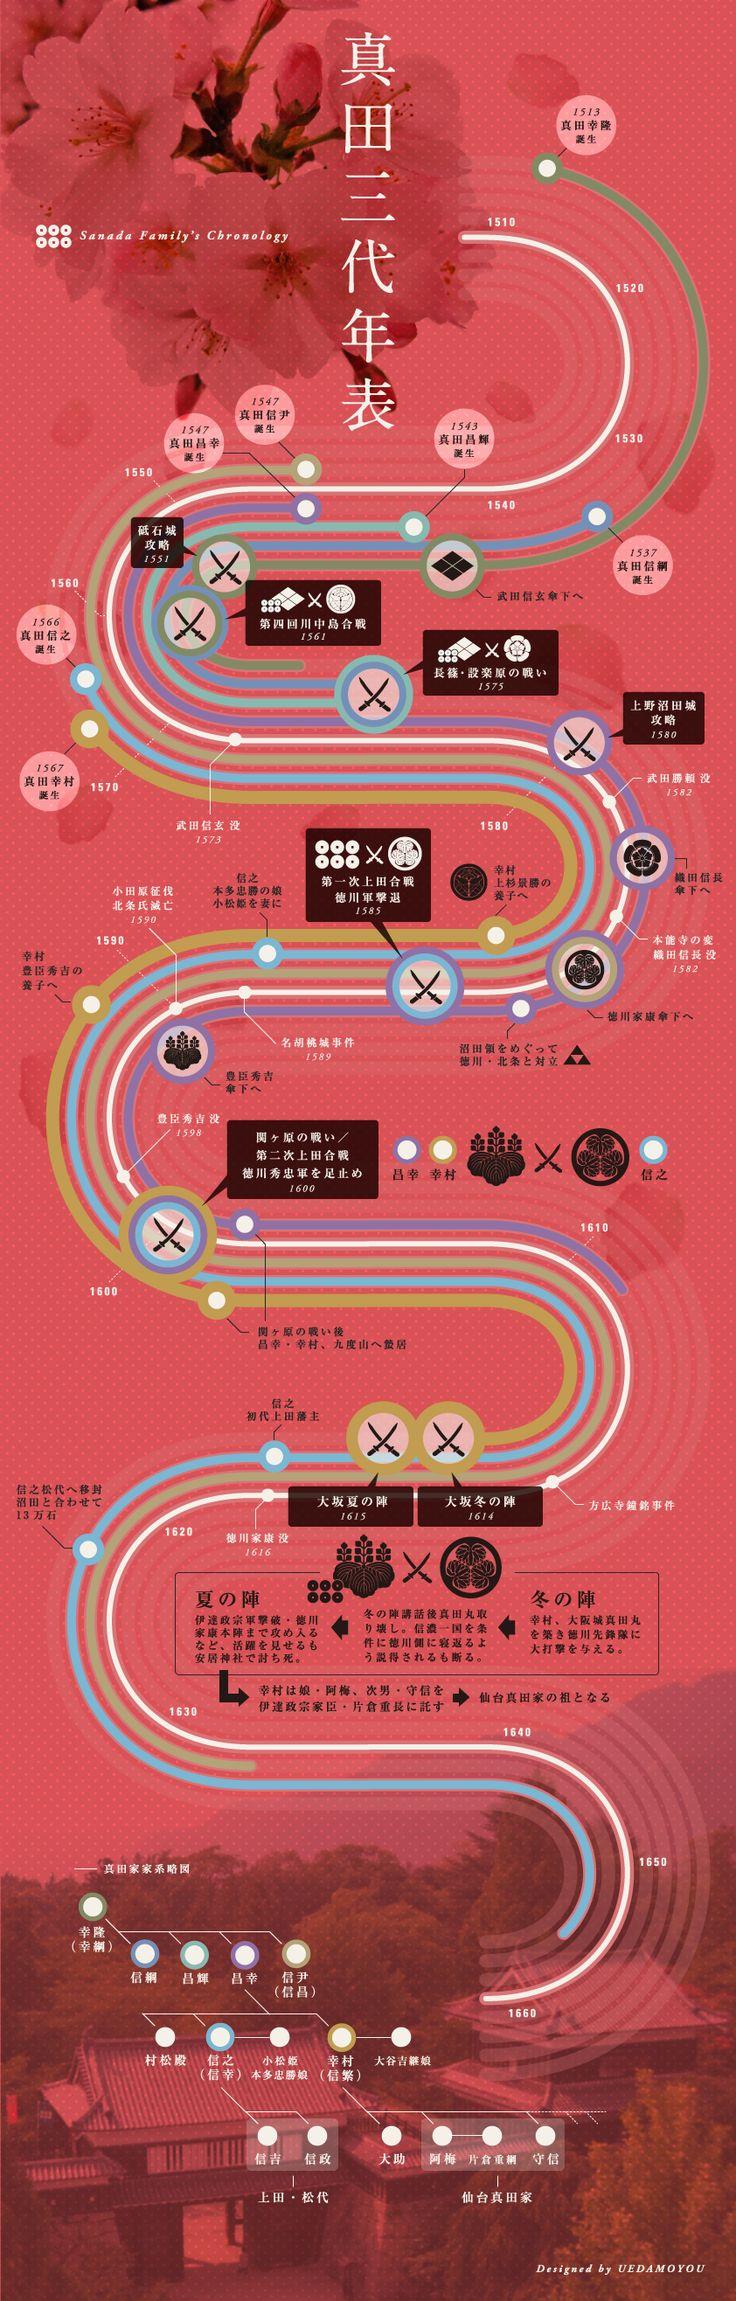 Sanada Family's Chronology 真田三代年表   ウエダモヨウ 信州長野県上田市の情報発信サイト #japan #nagano #ueda…